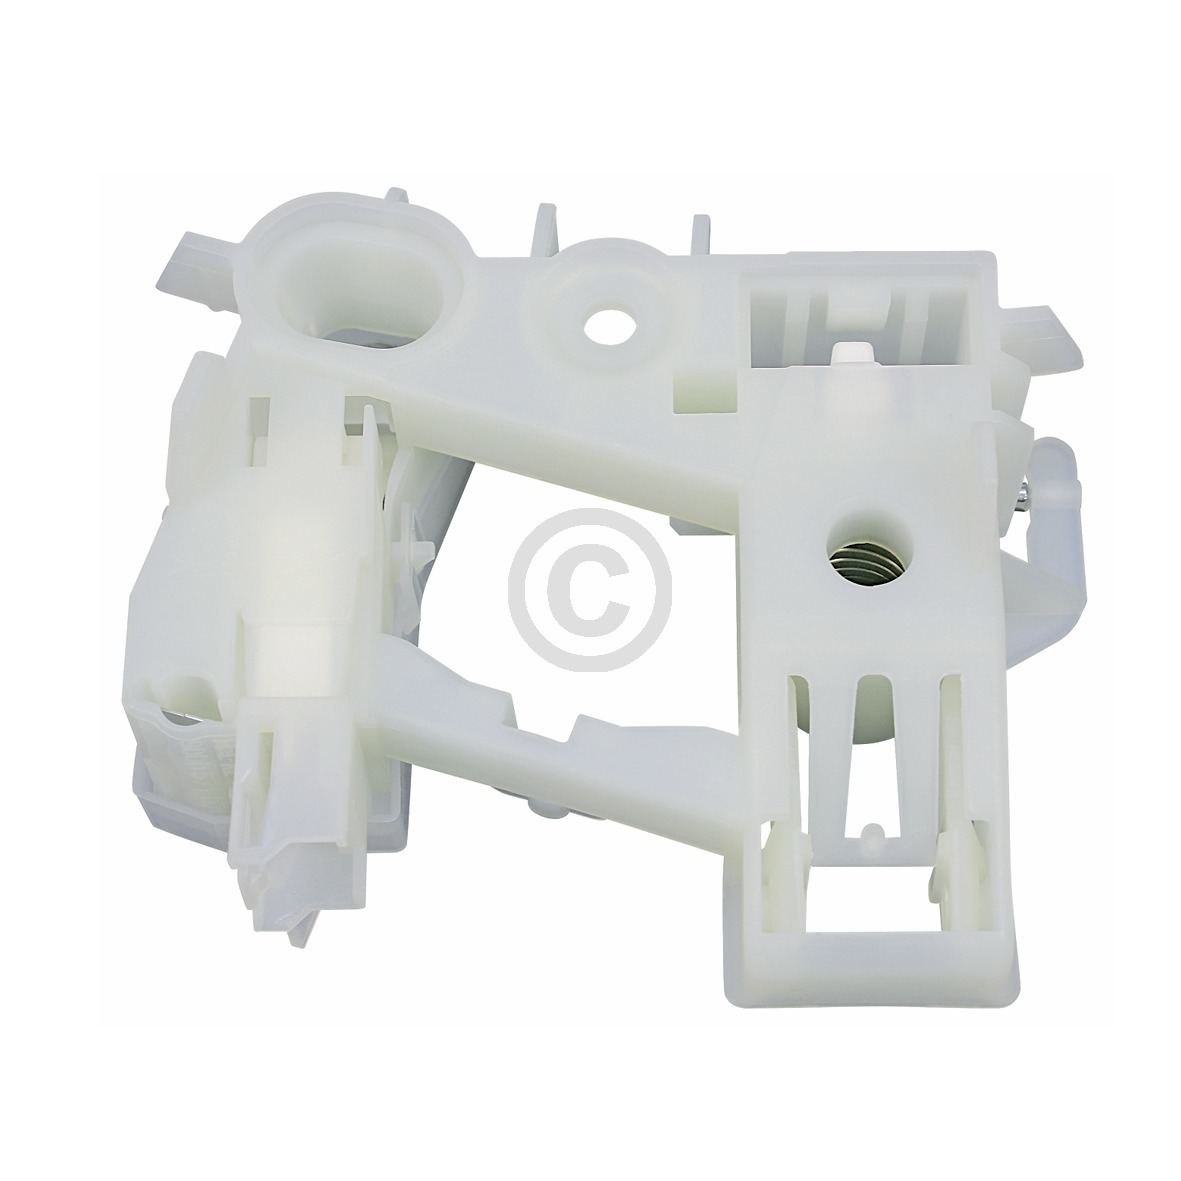 Türverriegelung EMZ 00622324 622324 Bosch, Siemens, Neff